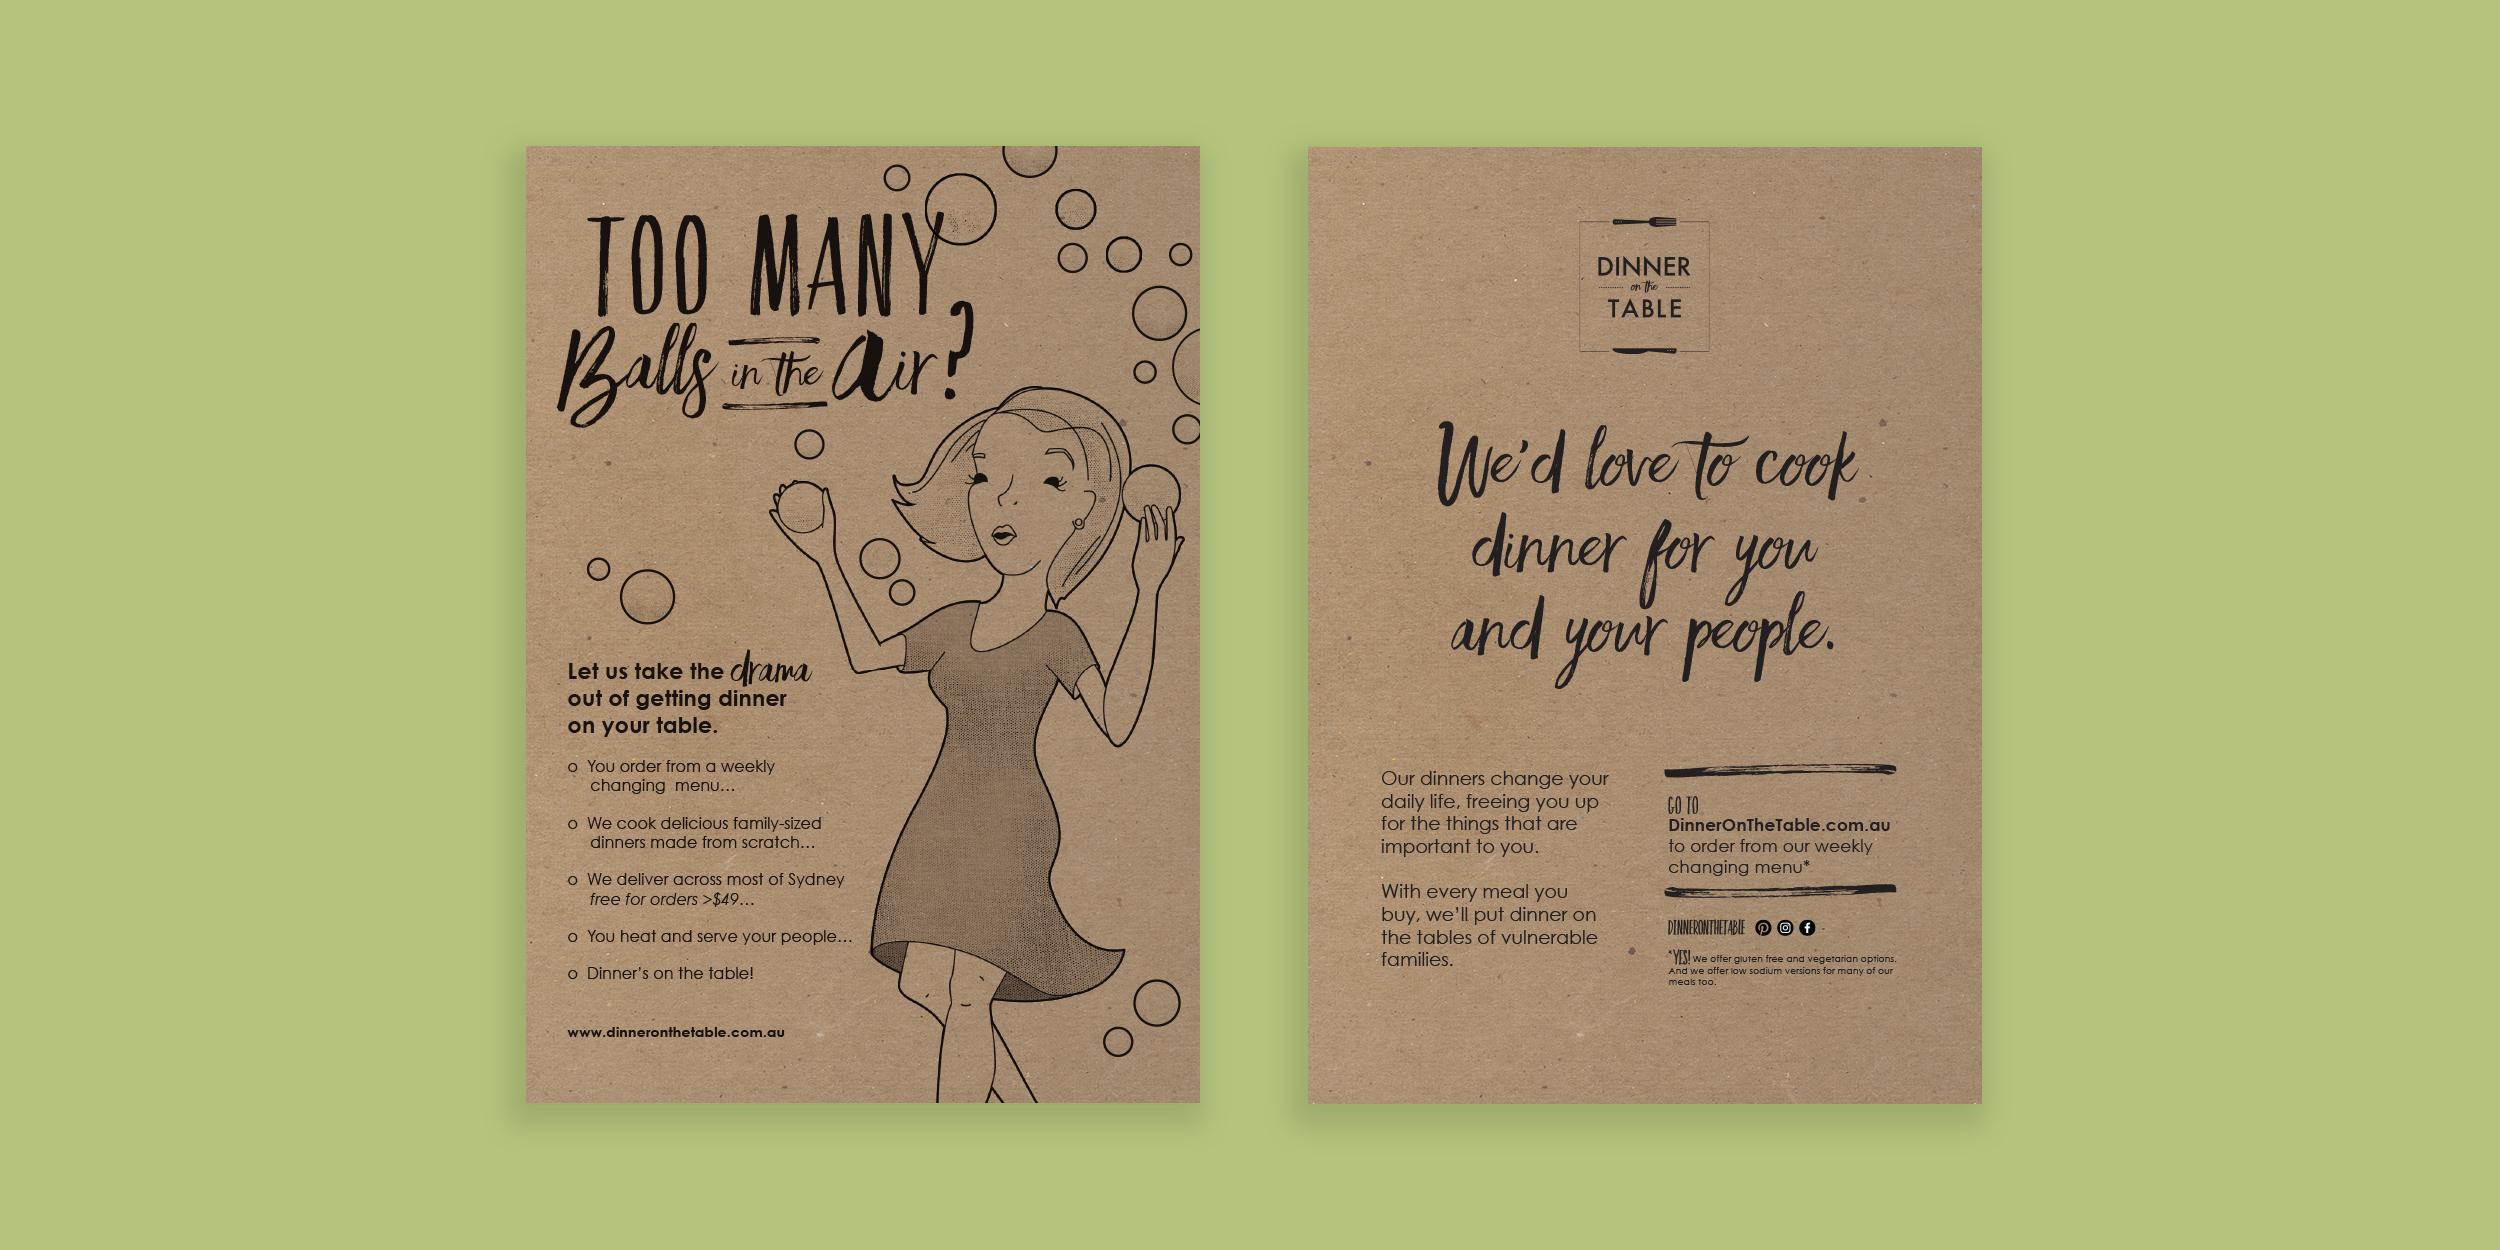 DinnerOnTheTable-A4-Flyer-ANJ-green.jpg